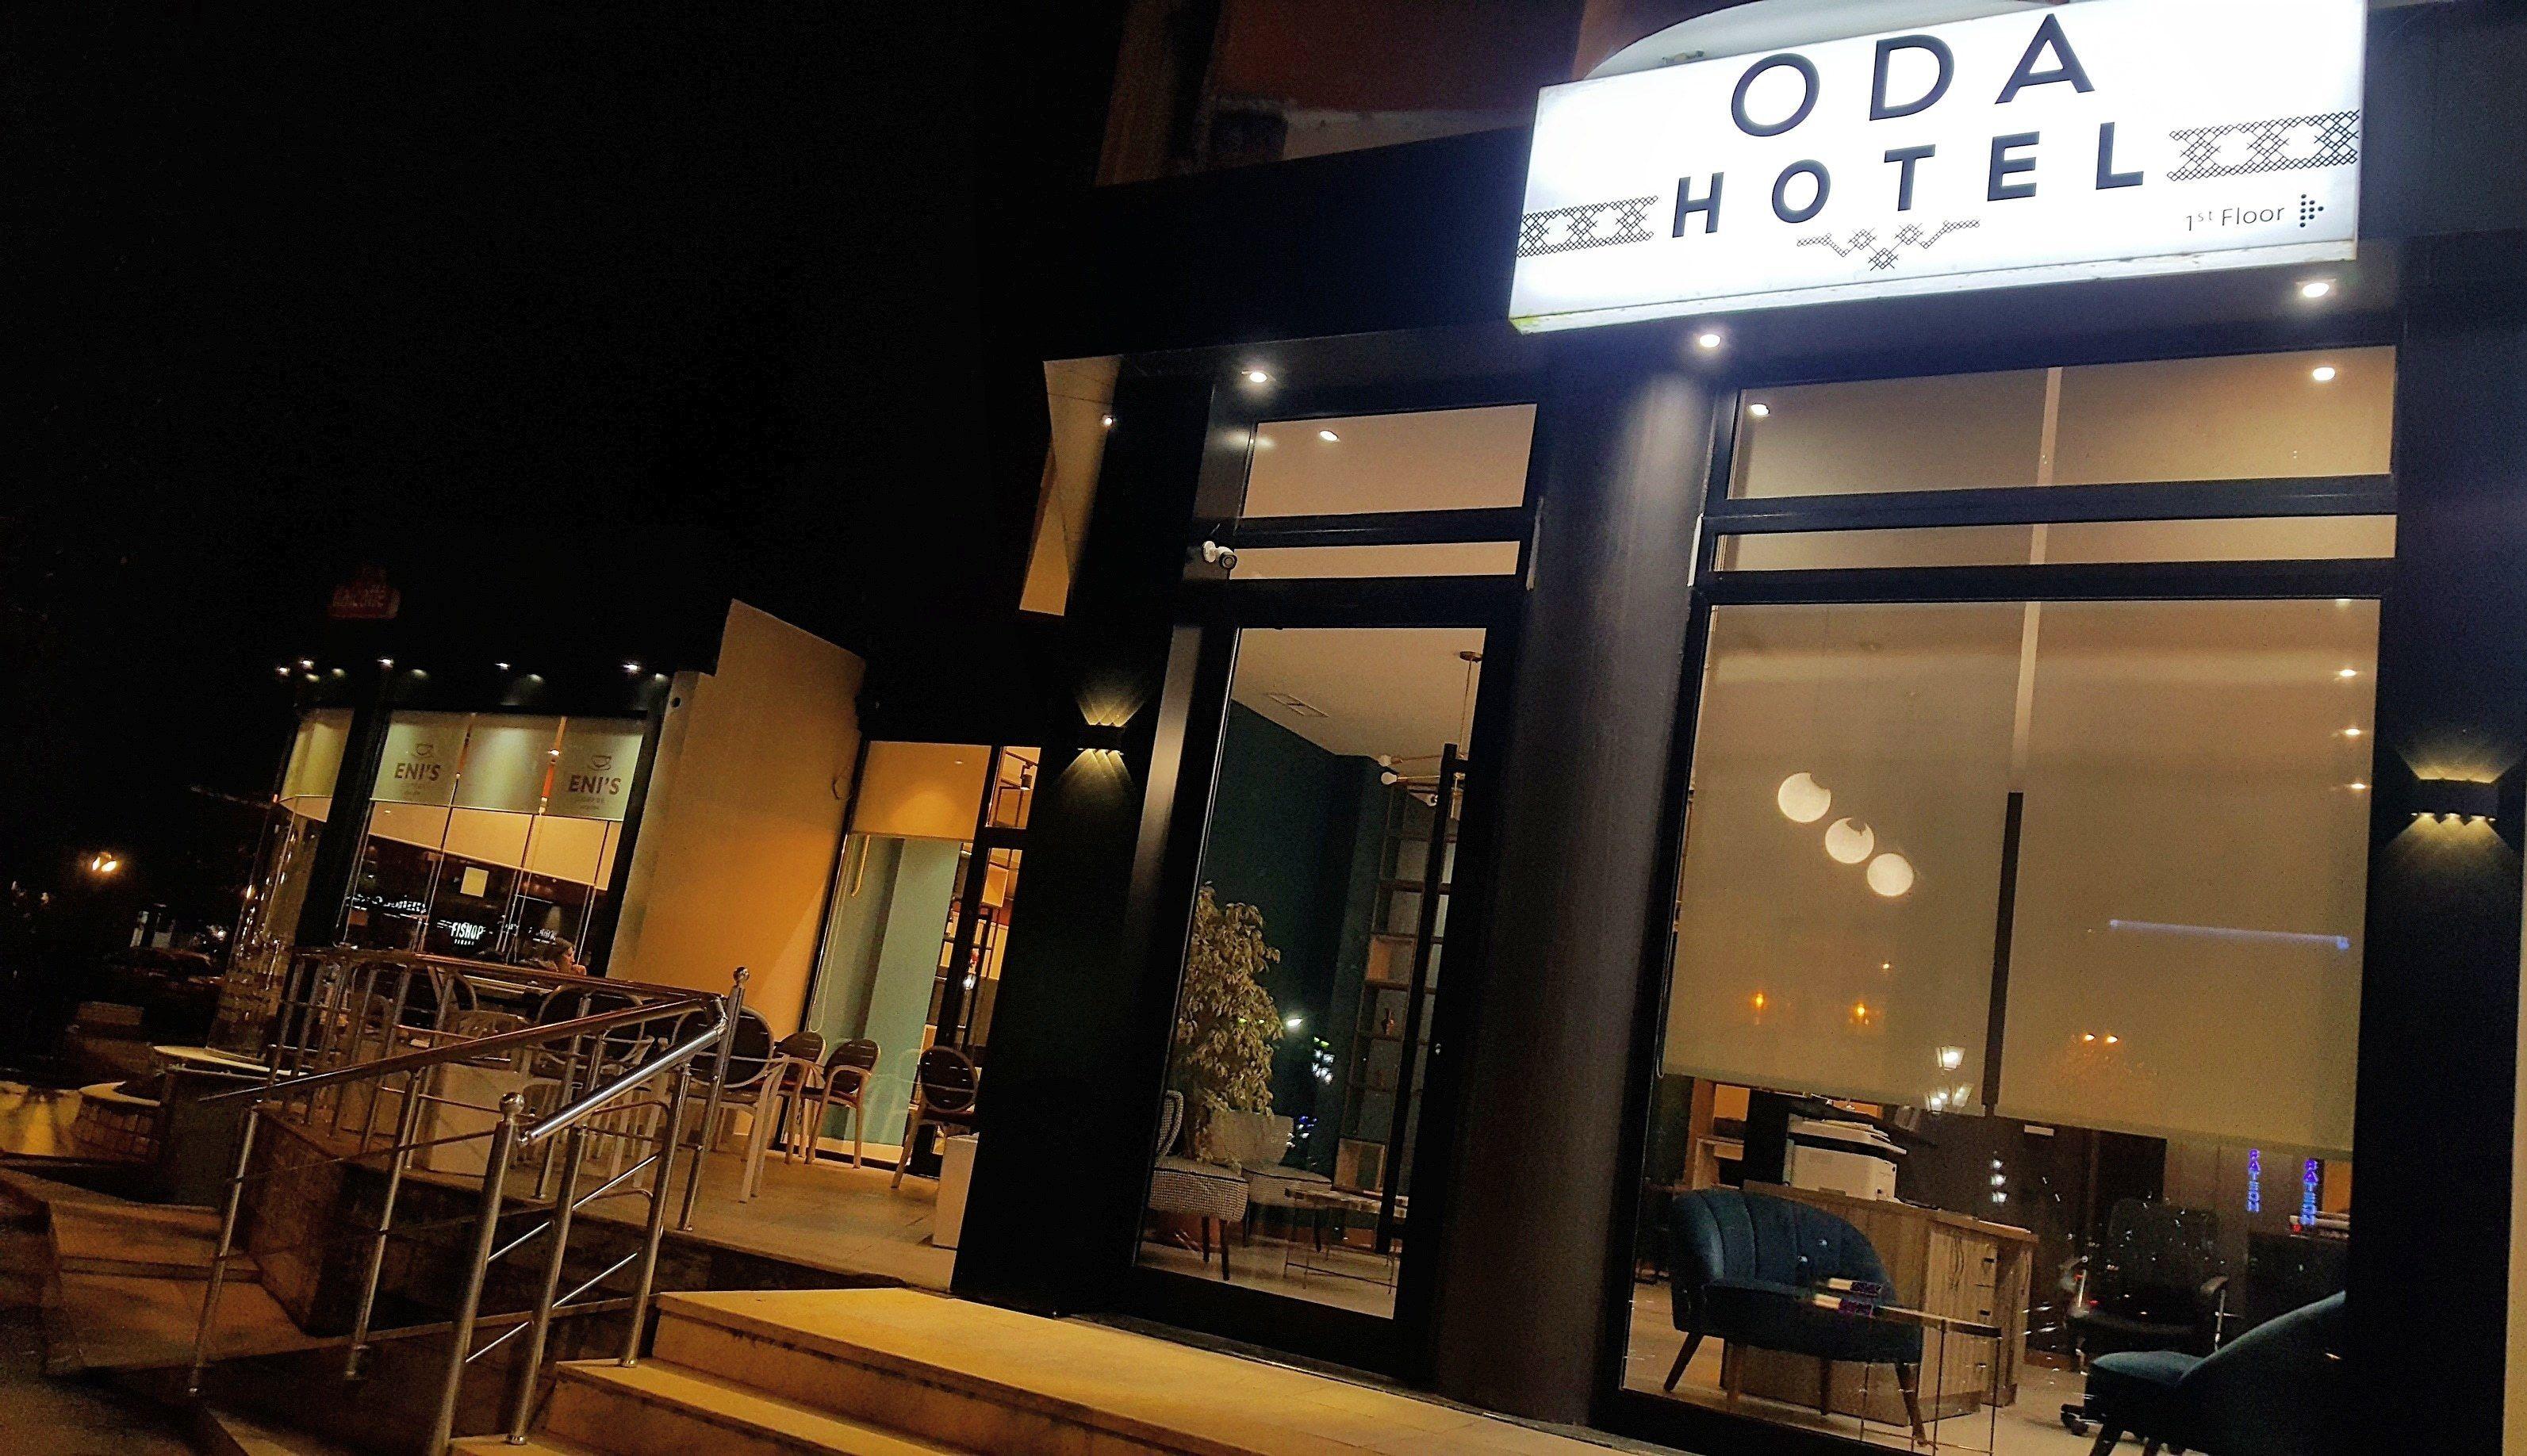 Oda Hotel Tirana